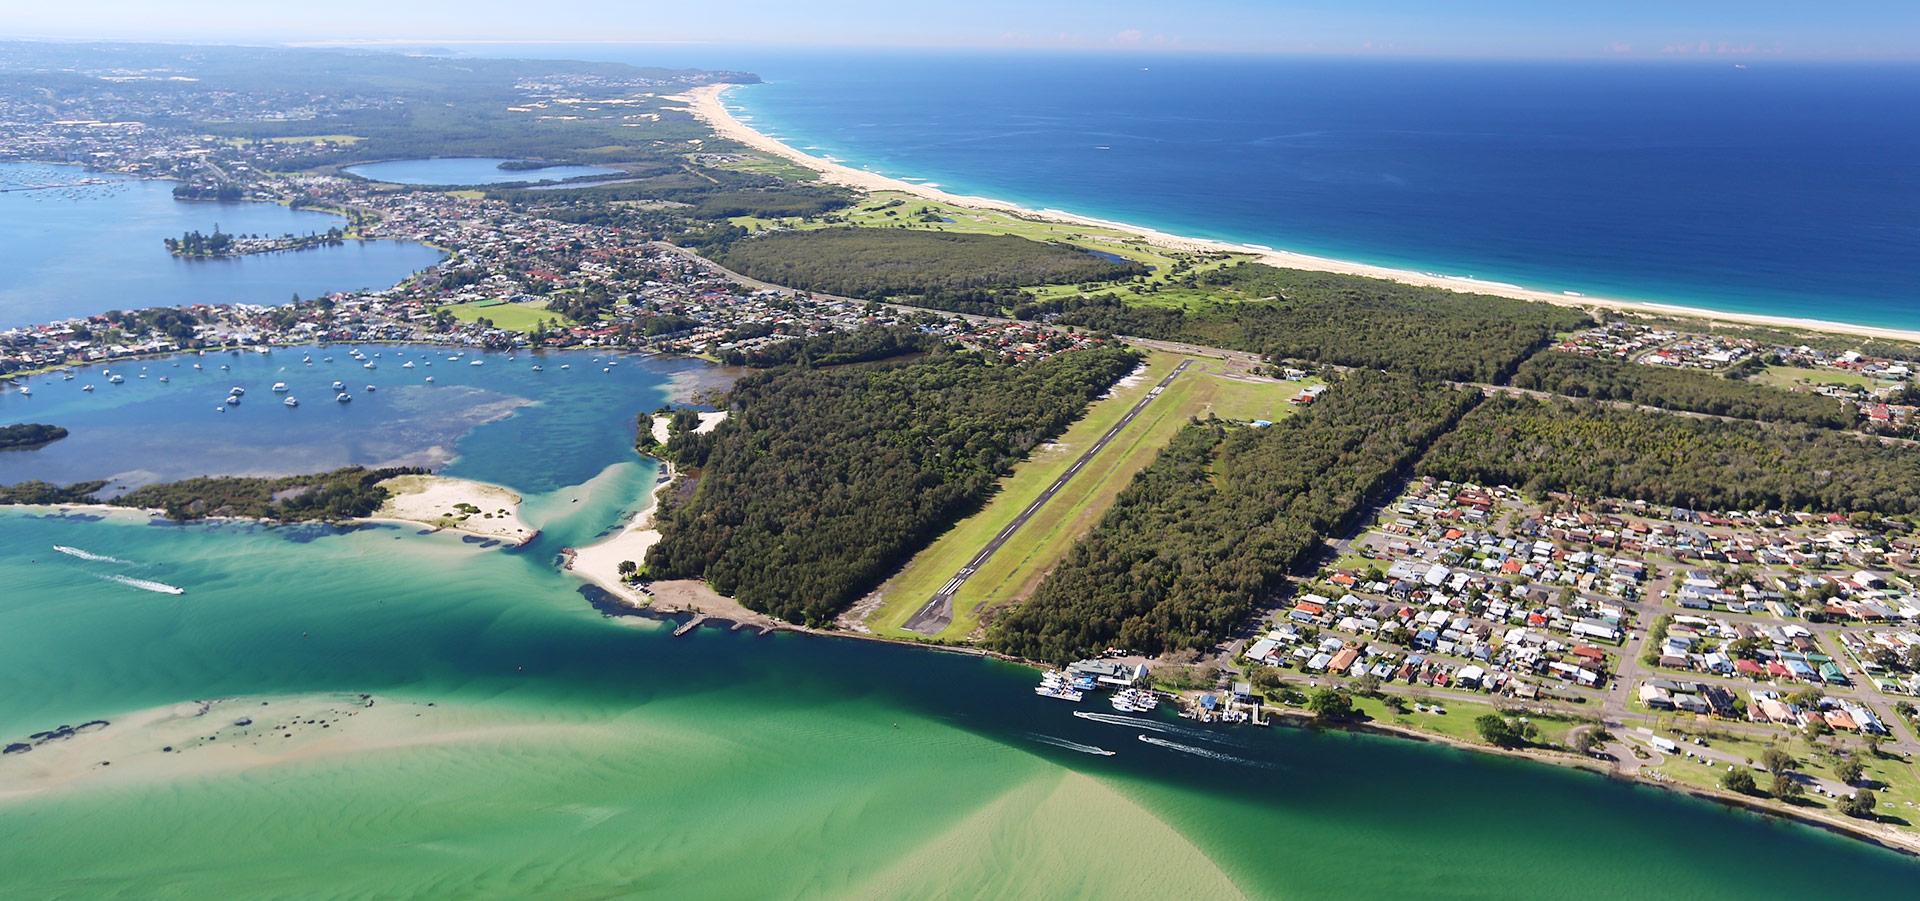 Welcome to Lake Macquarie Airport